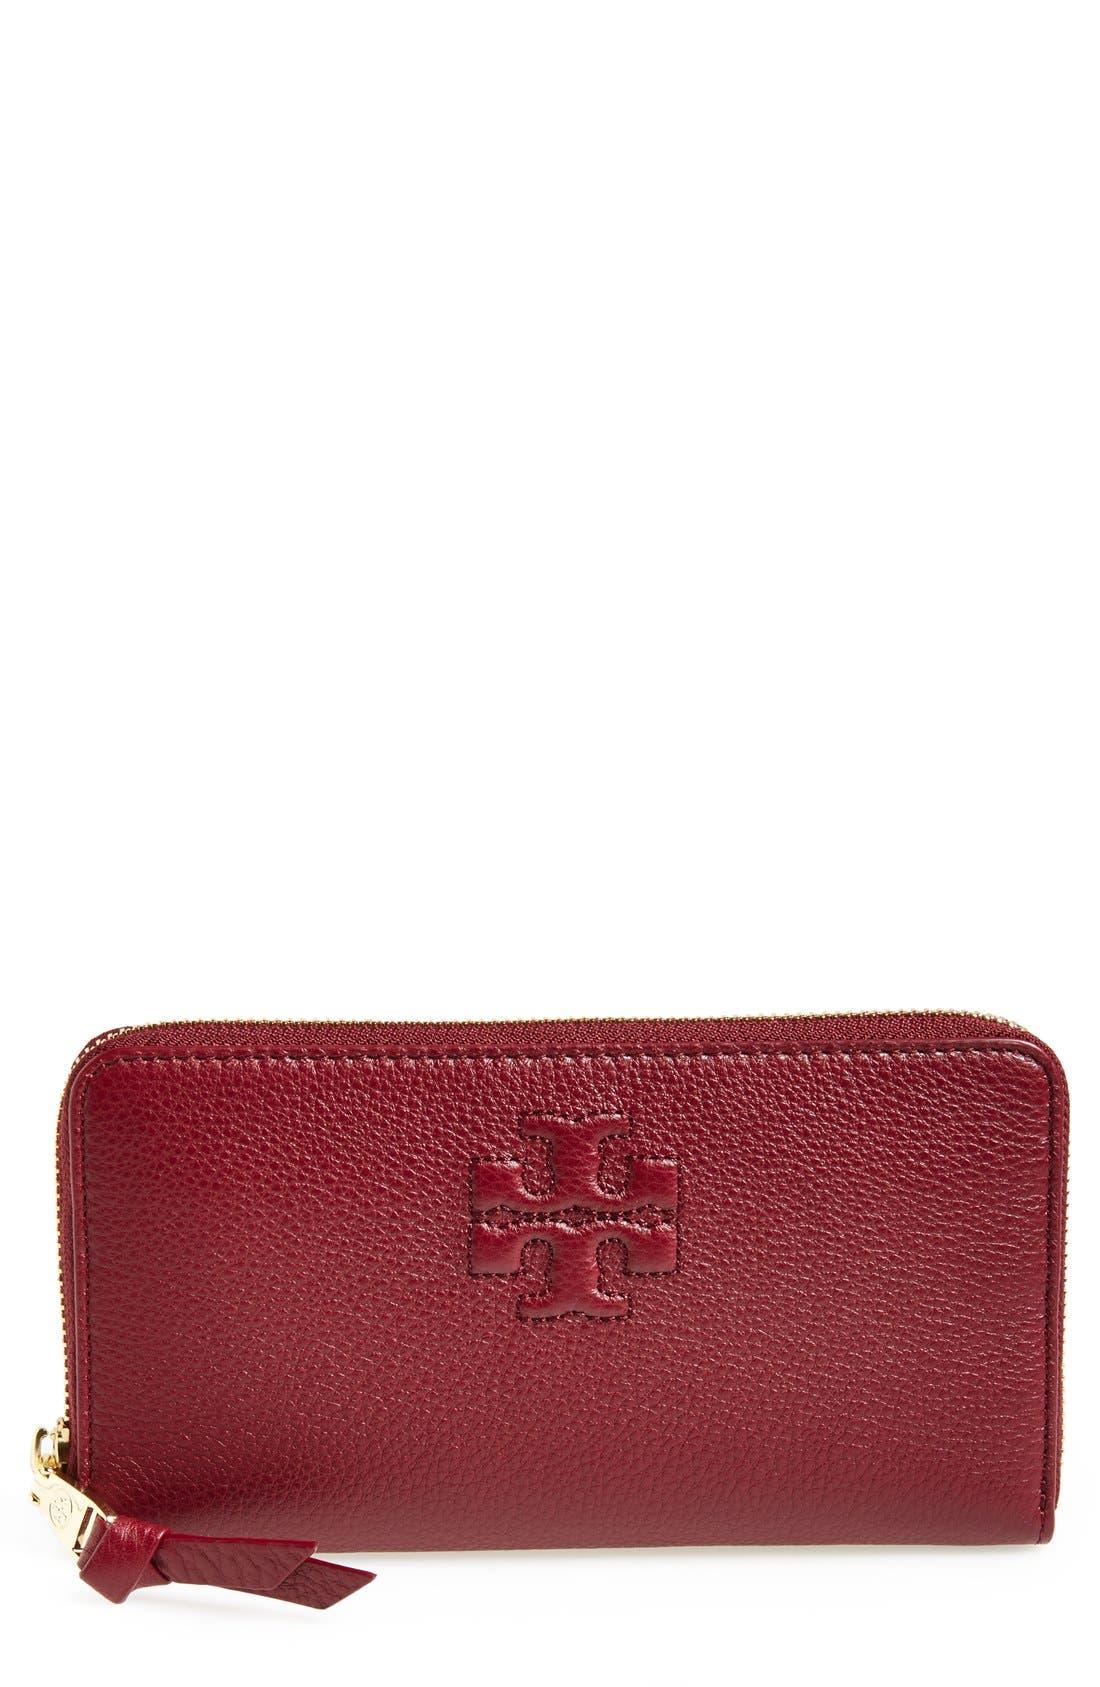 Main Image - Tory Burch 'Thea' Zip Around Wallet